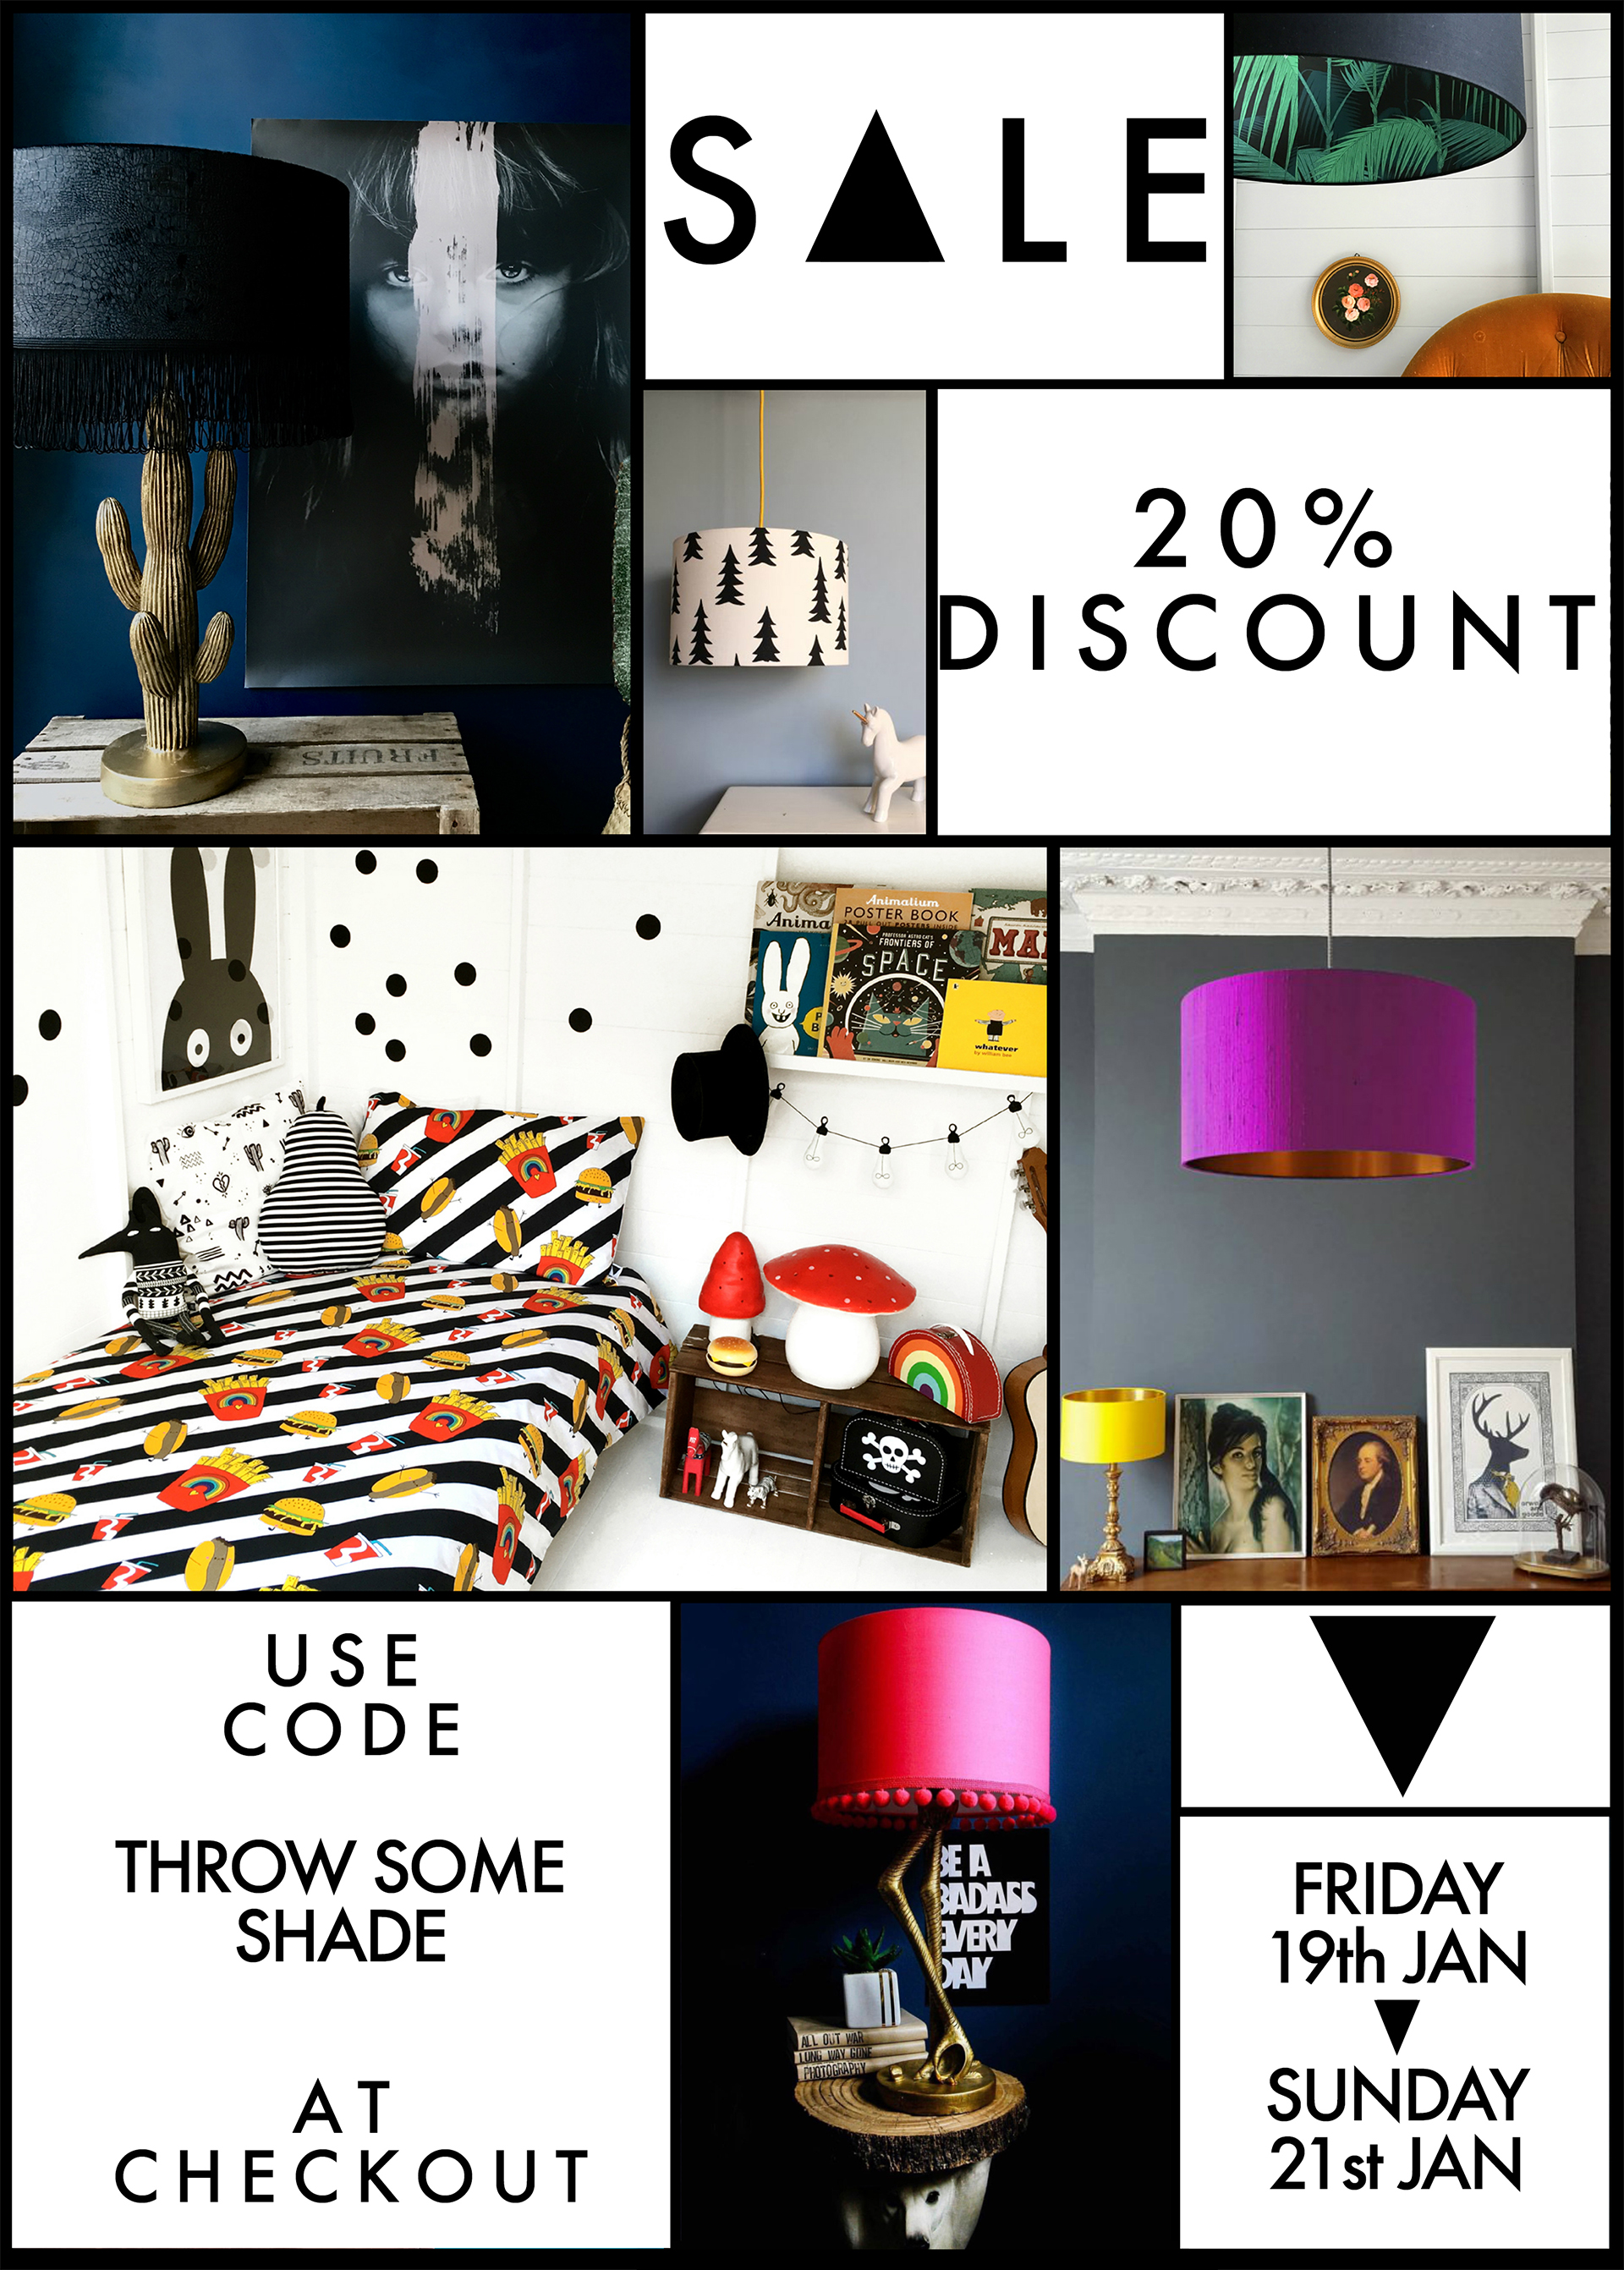 Super Sale discounts at Love Frankie